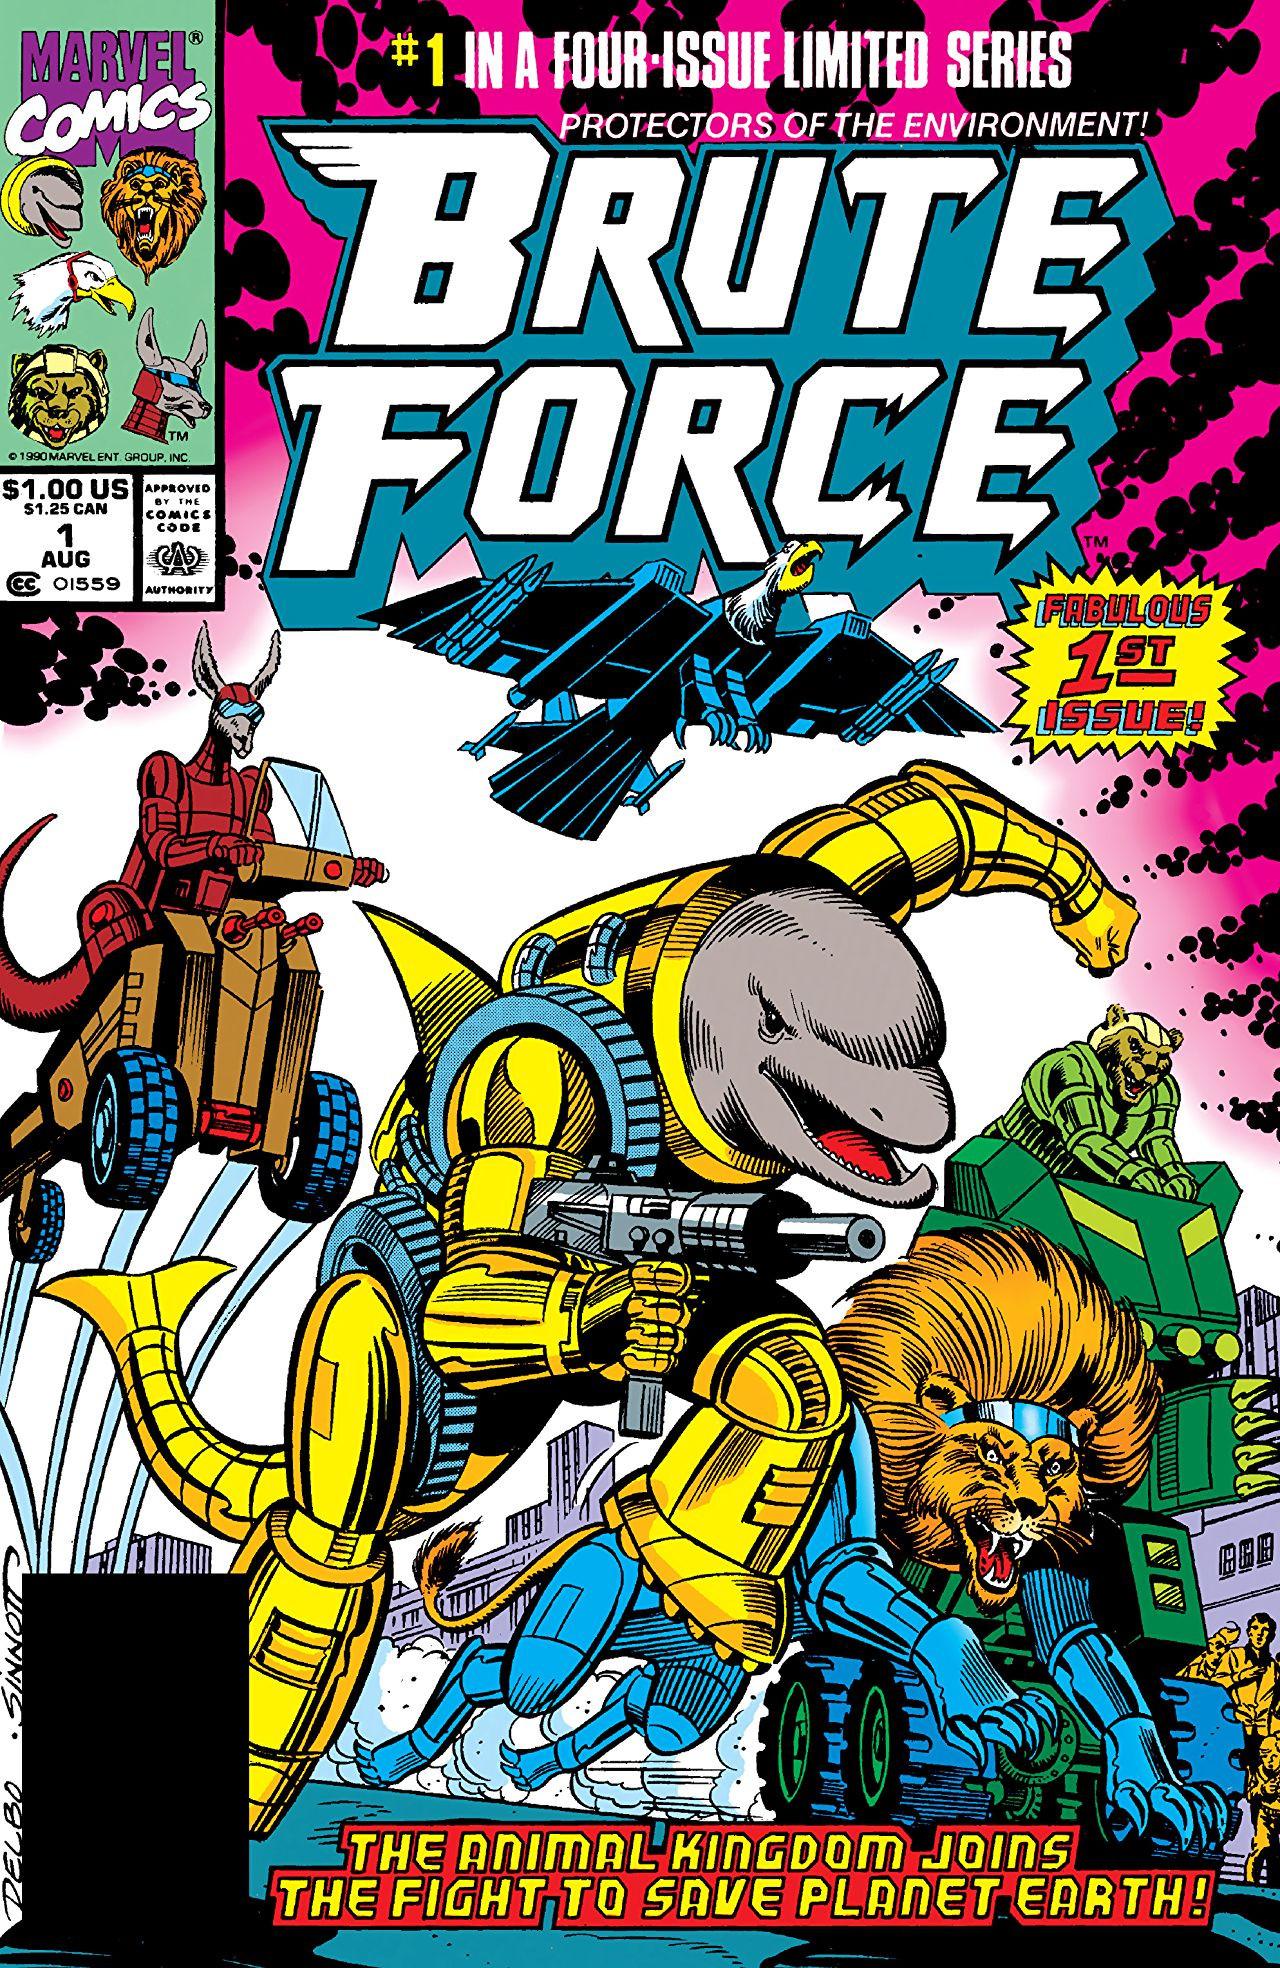 Brute Force (Animals) (Earth-616) | Marvel Database ...